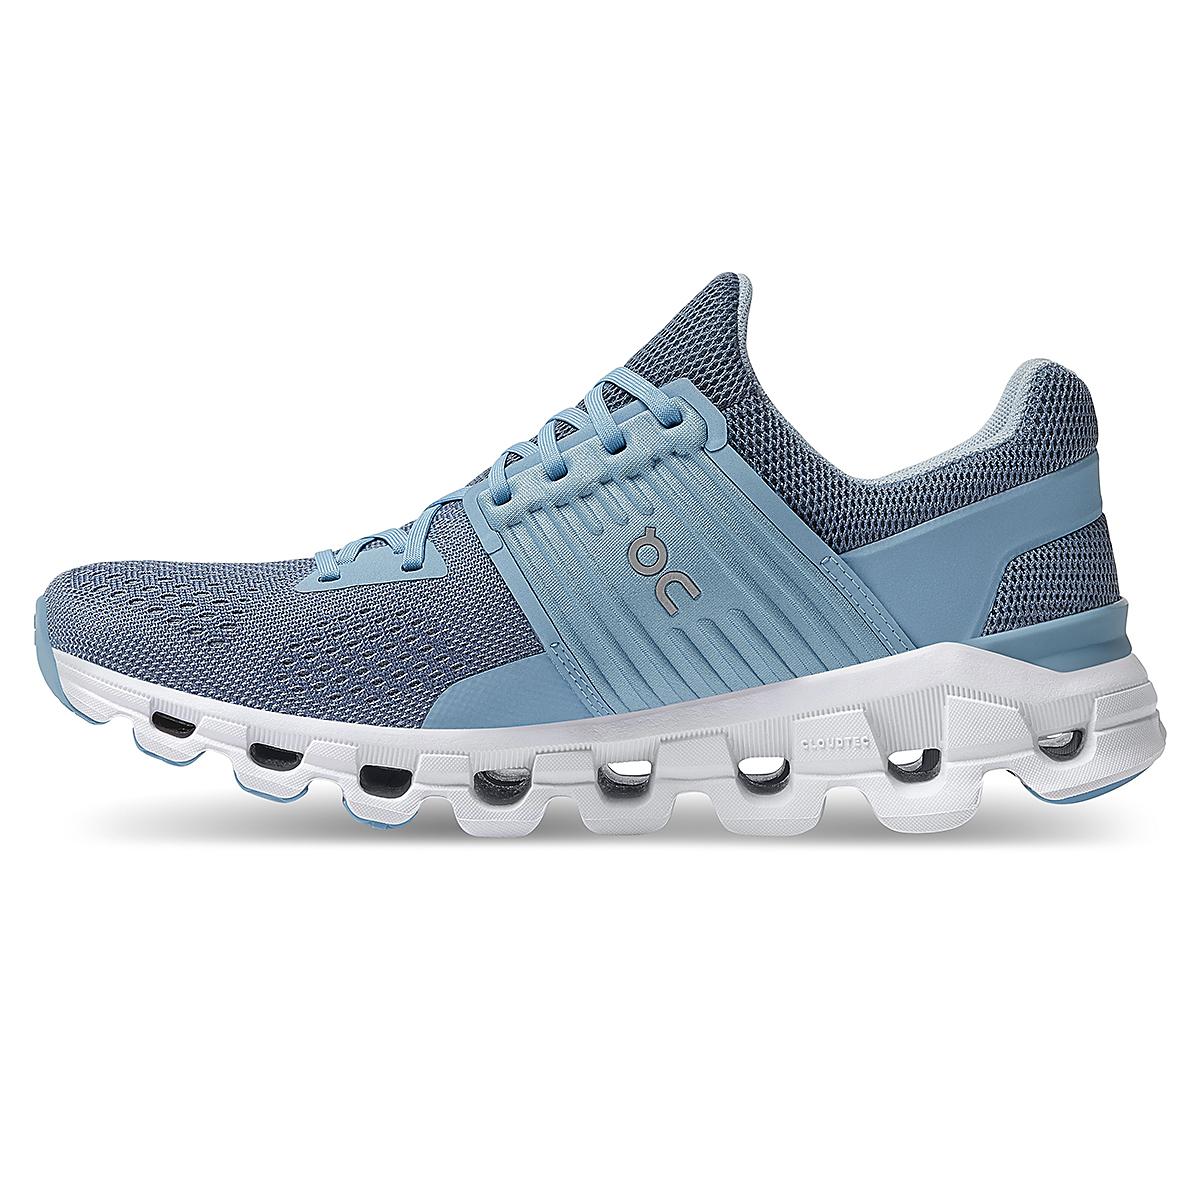 Women's On Cloudswift 2.0 Running Shoe - Color: Lake/Sky - Size: 5 - Width: Regular, Lake/Sky, large, image 3